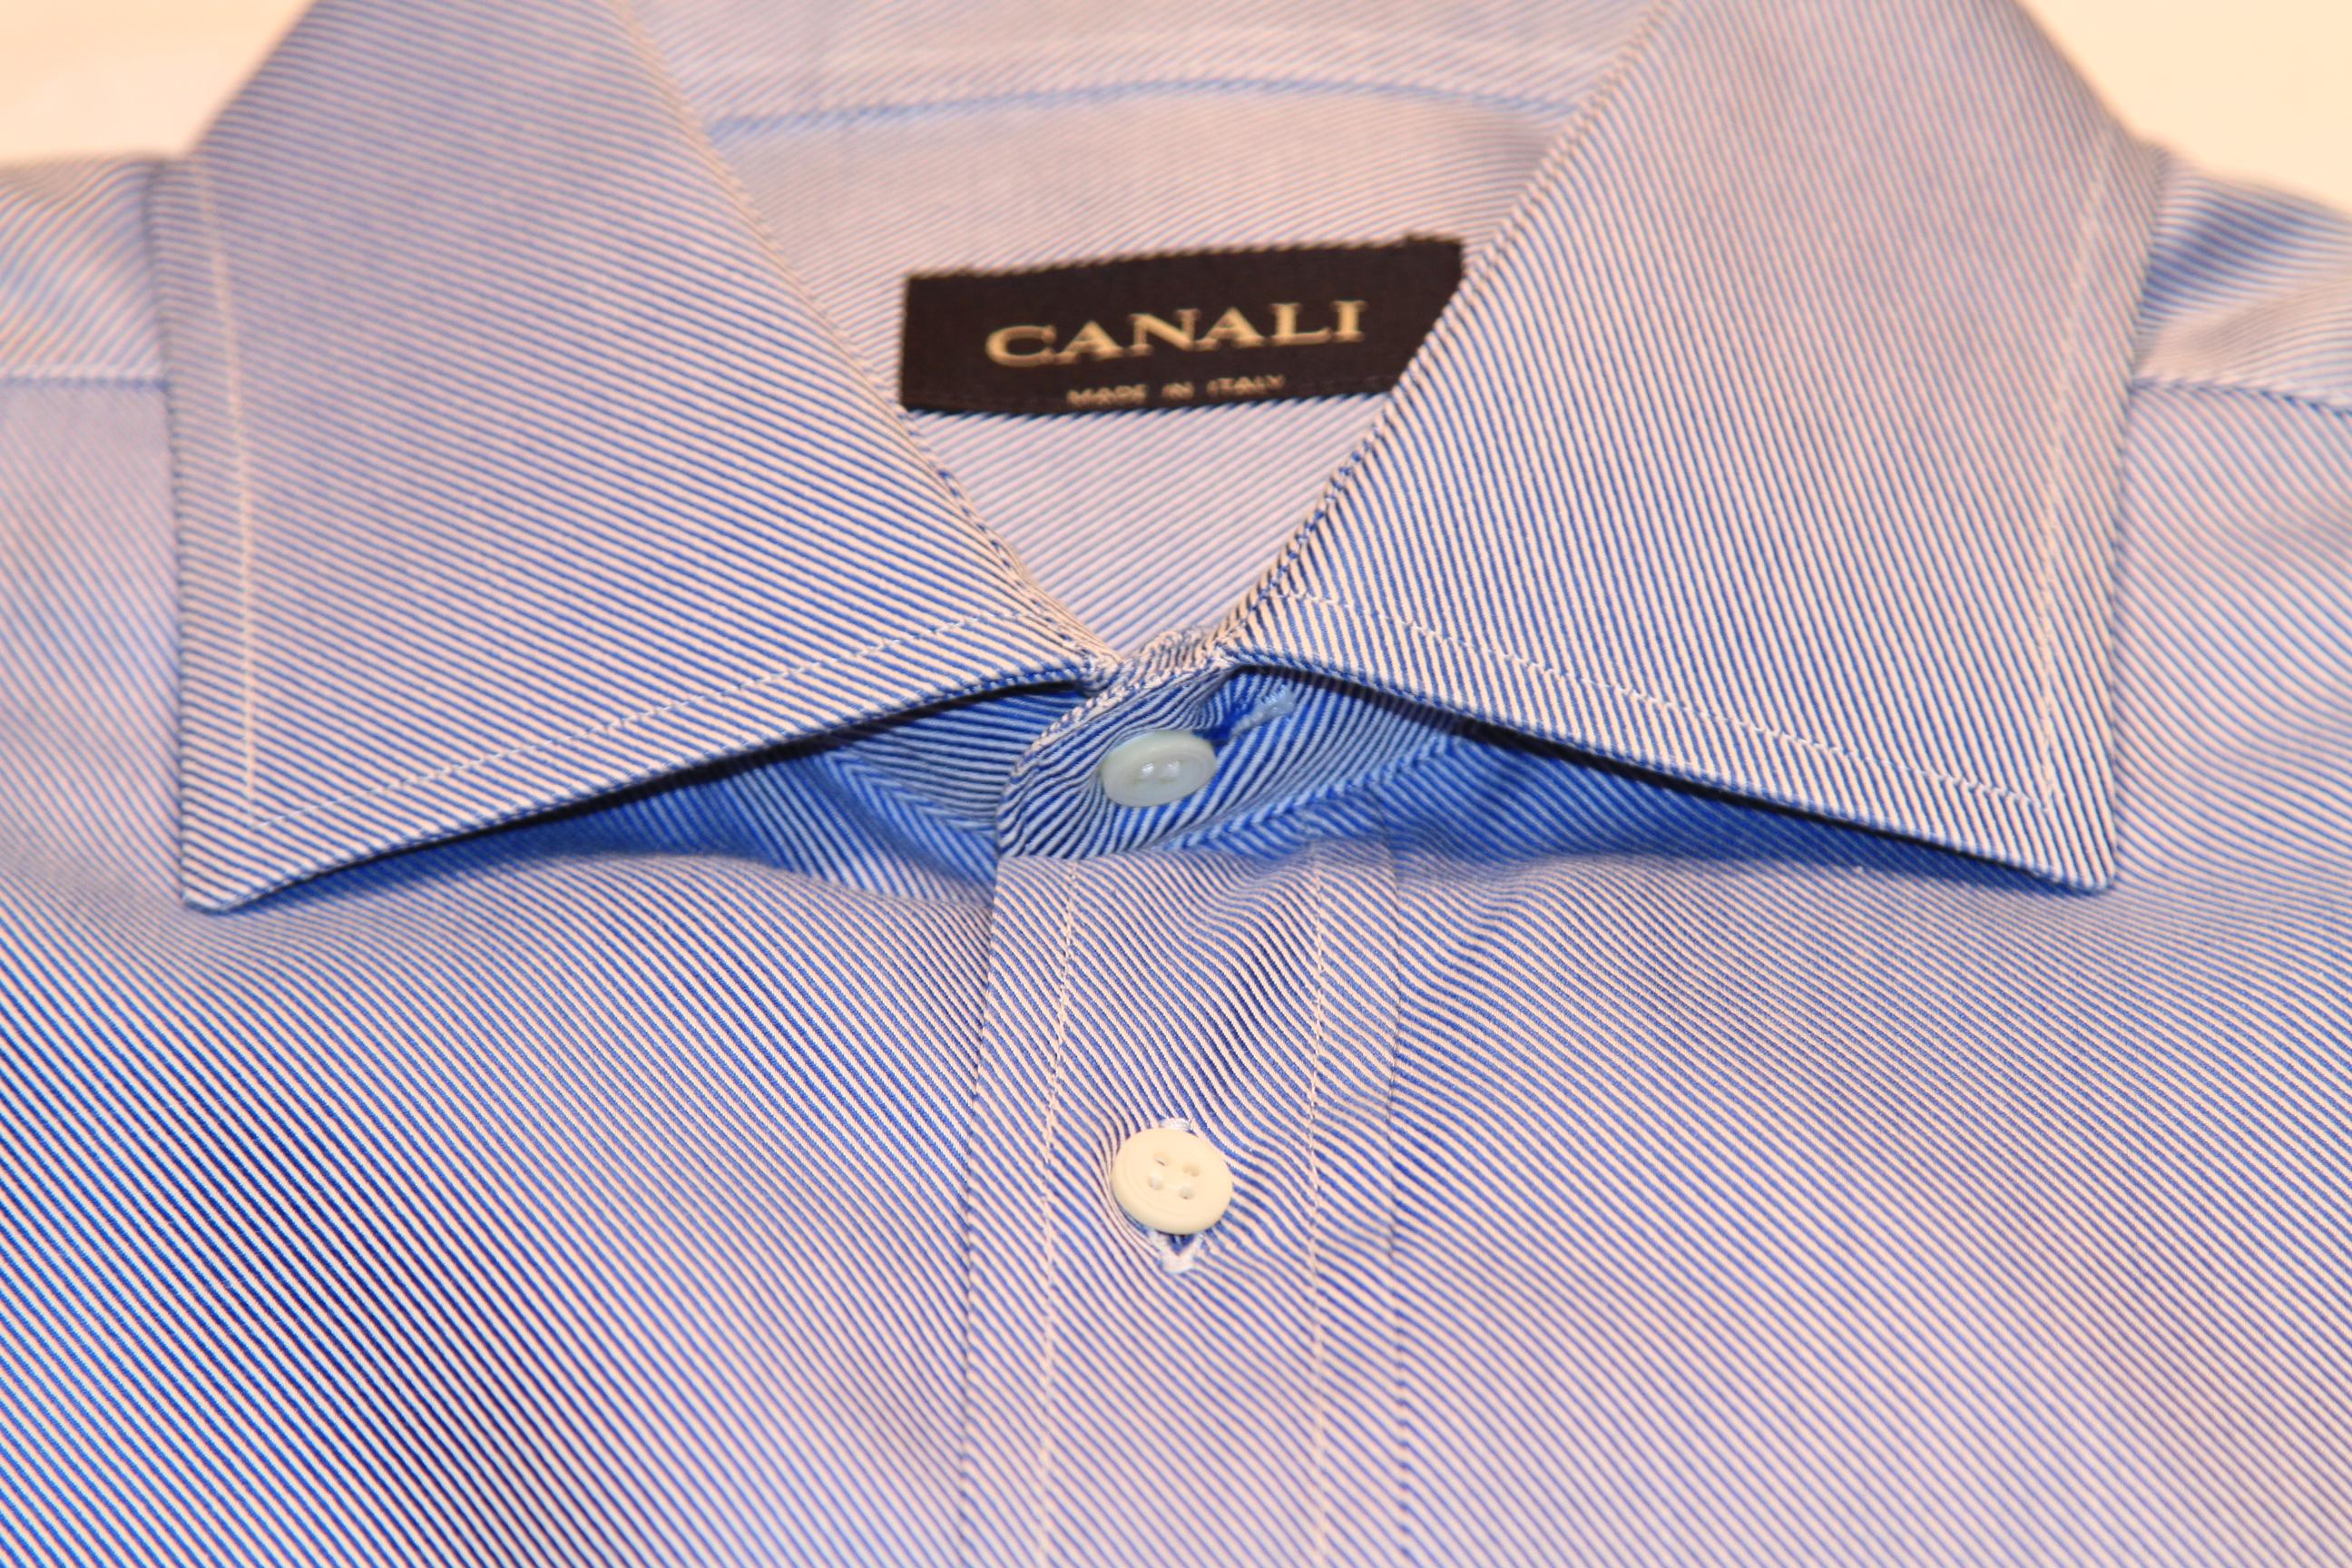 #18 - Canali 41/16 Darker Blue Solid (diagonal type pattern)